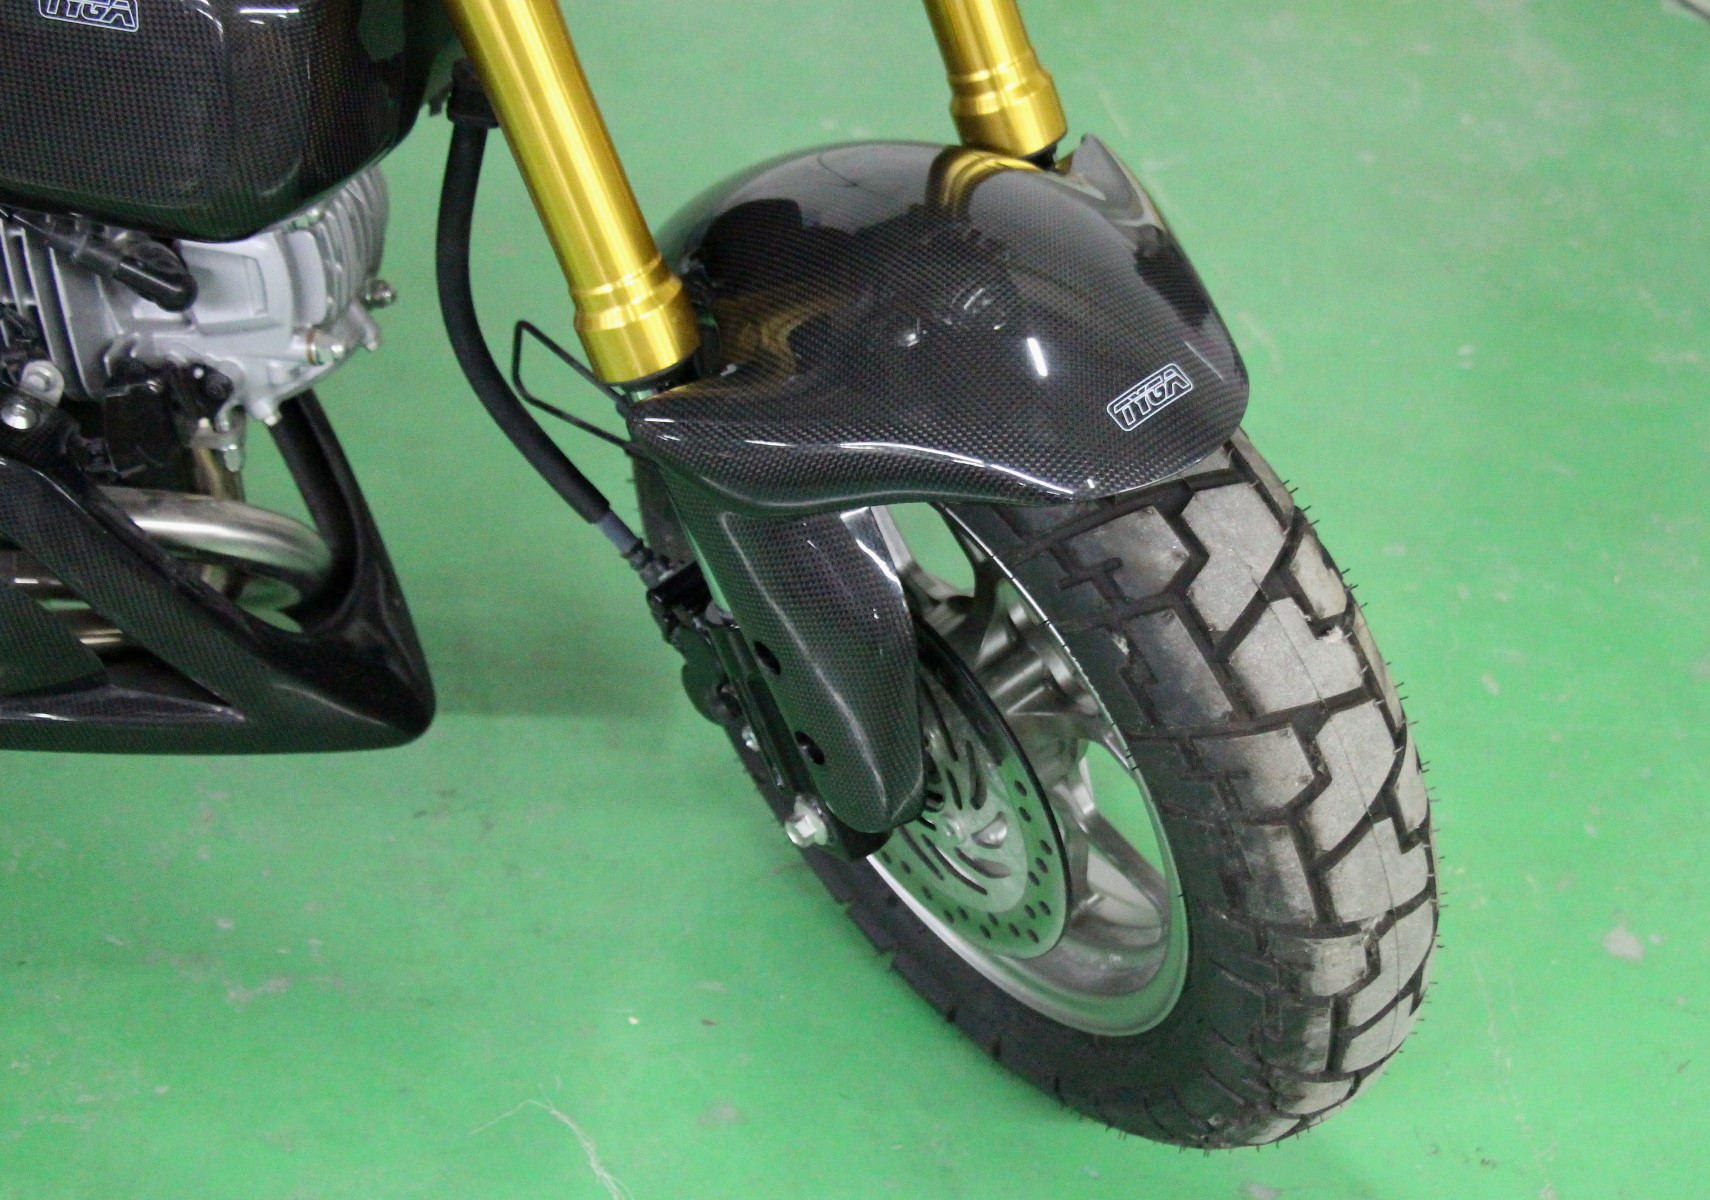 Front Fender Carbon Hugger Type Monkey 125 Msx125 Grom Jap4performance Tyga U K